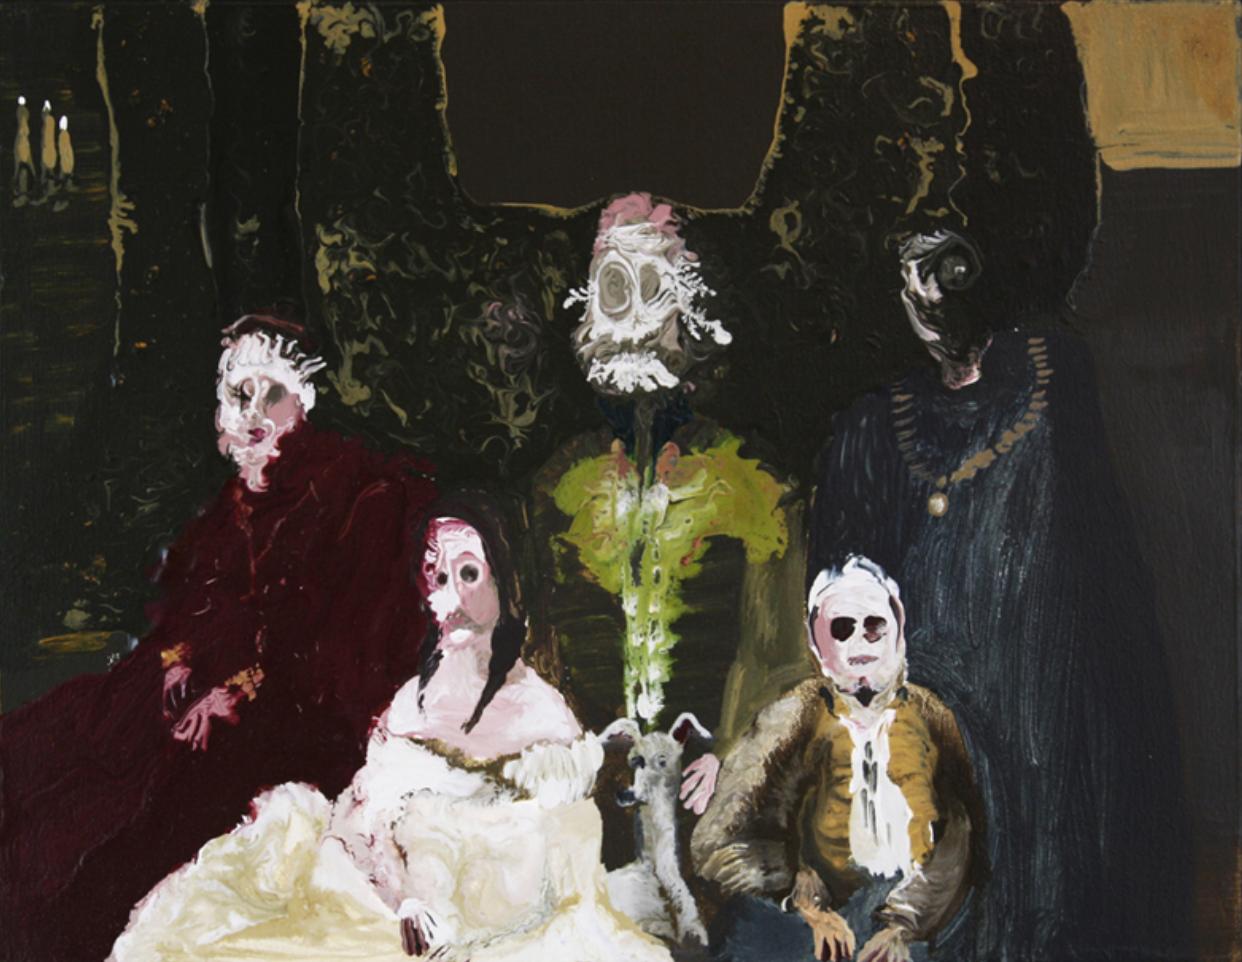 Genieve Figgis, Royal Friends, 2014. Acrylic on canvas. 16 x 20 inches.©Genieve Figgis; Courtesy of Harper's Books.